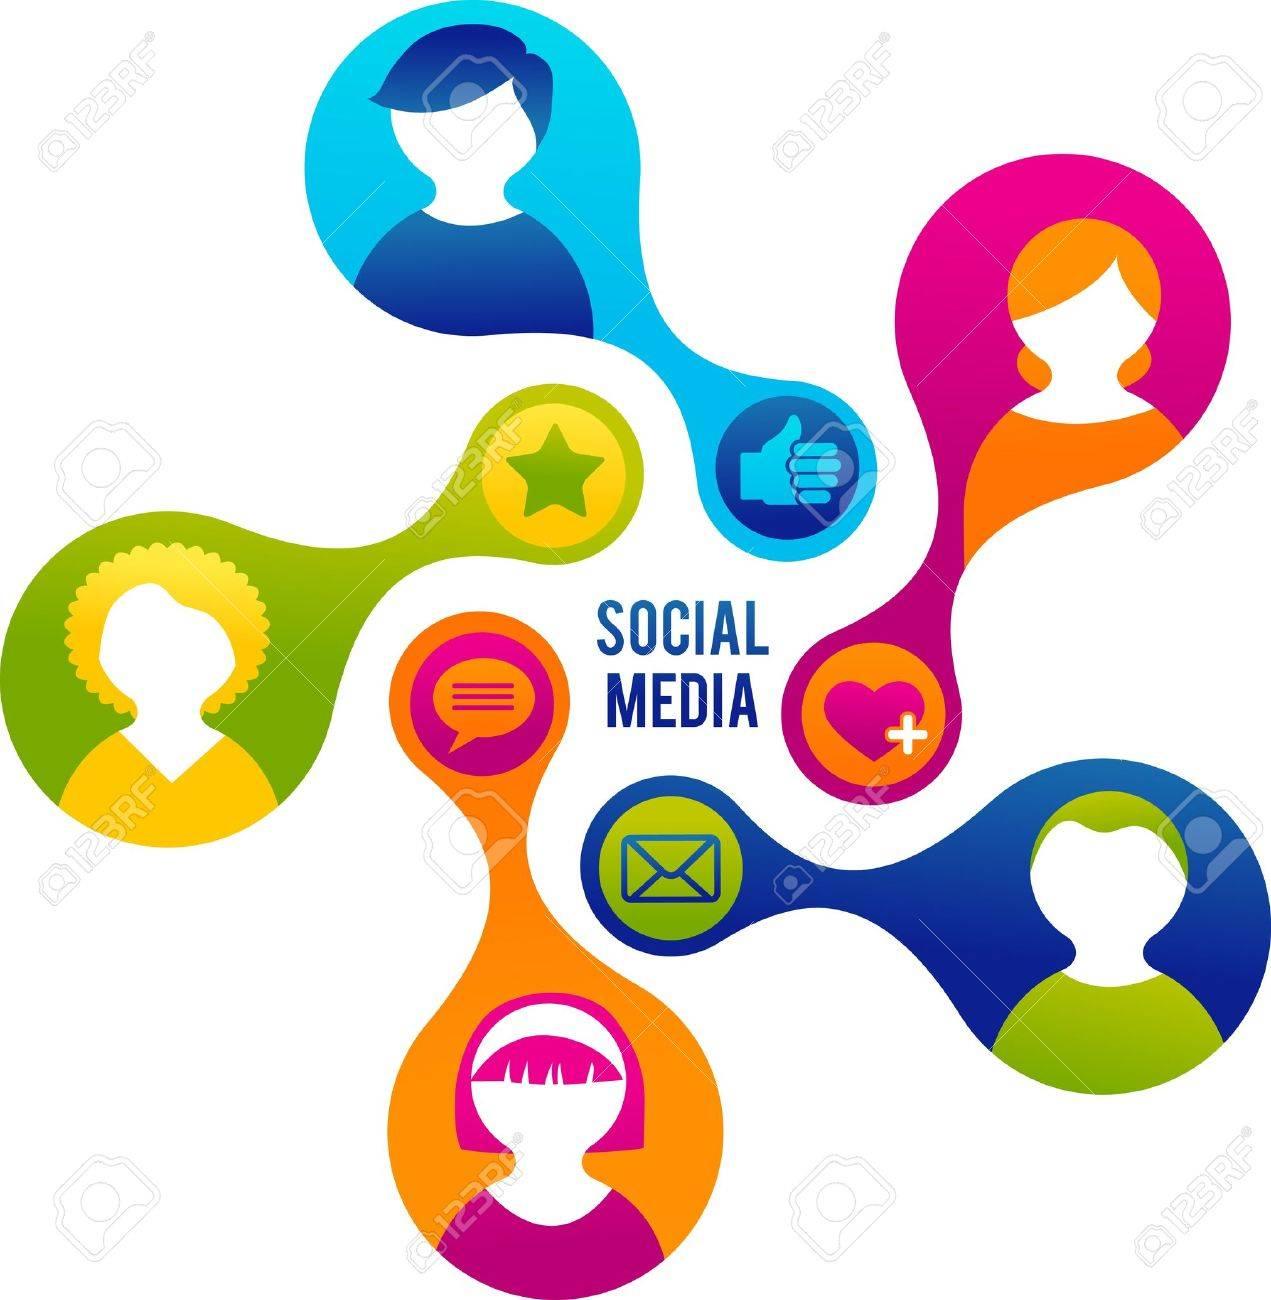 Social Media and network illustration - 12874774